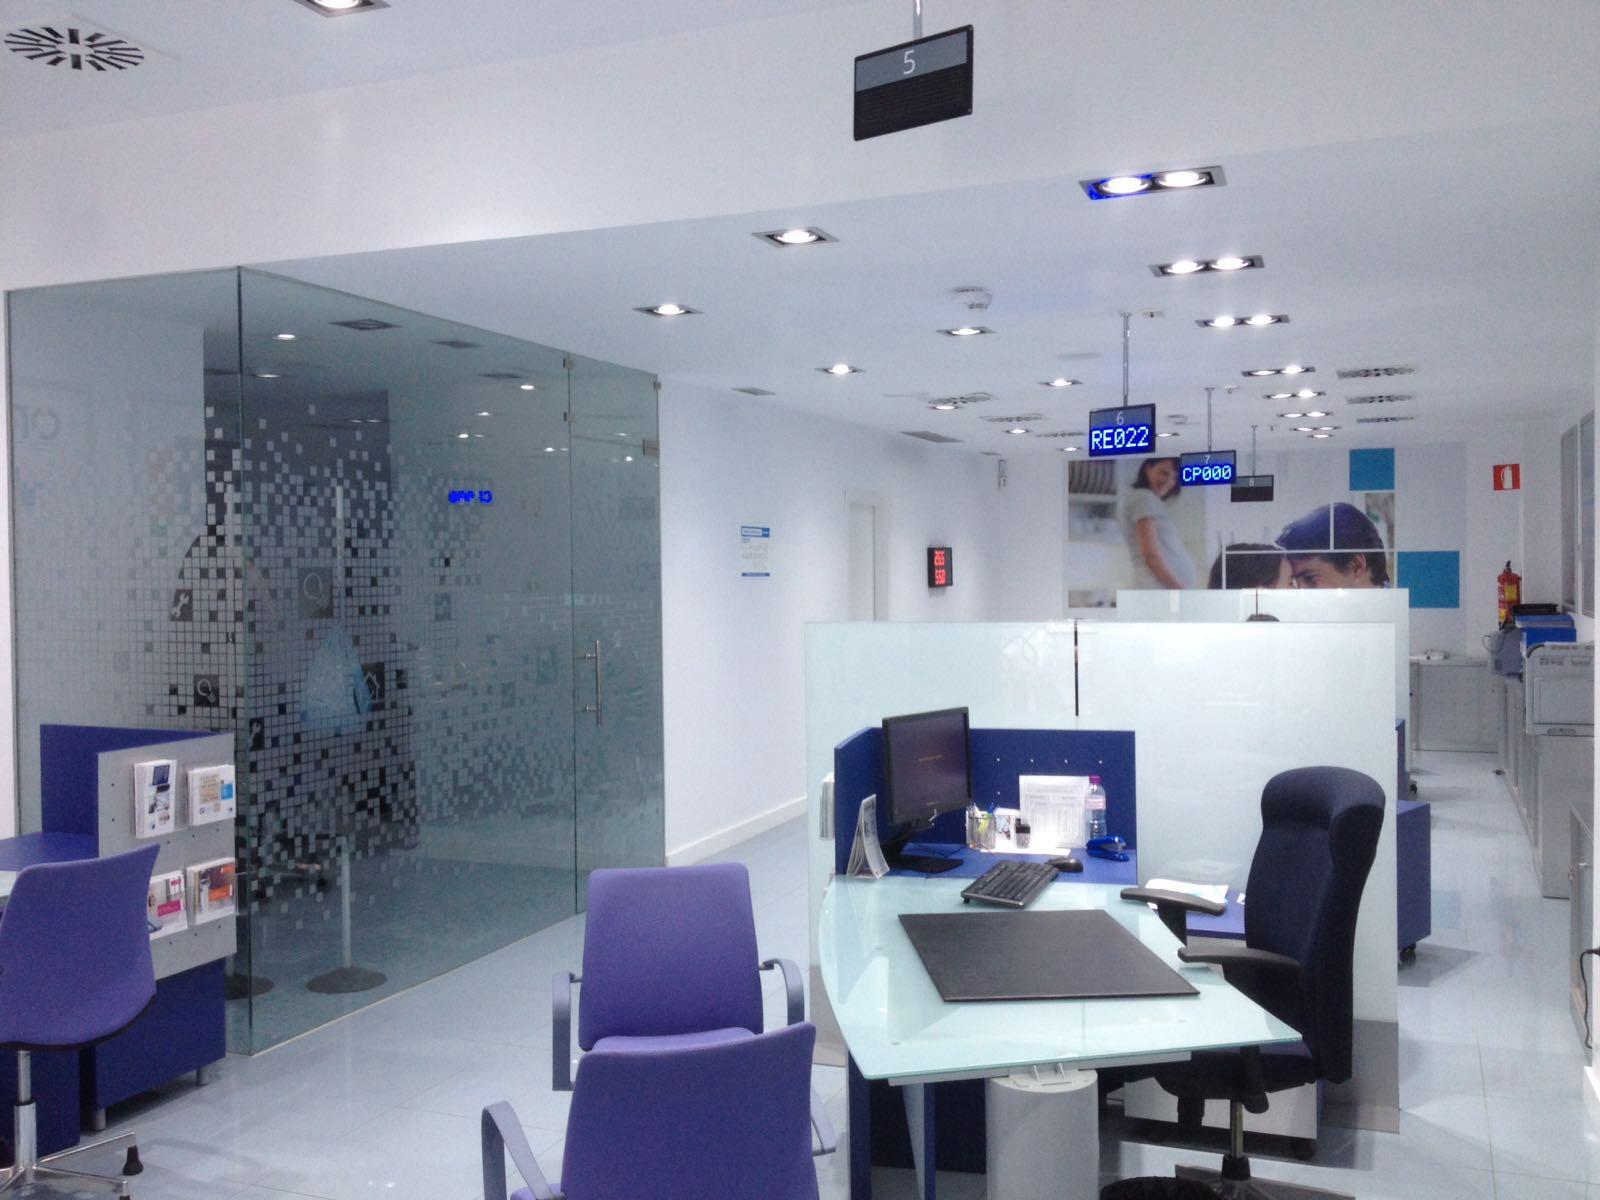 ideltec-projects-oficina-atencion-cliente-endesa-pic1